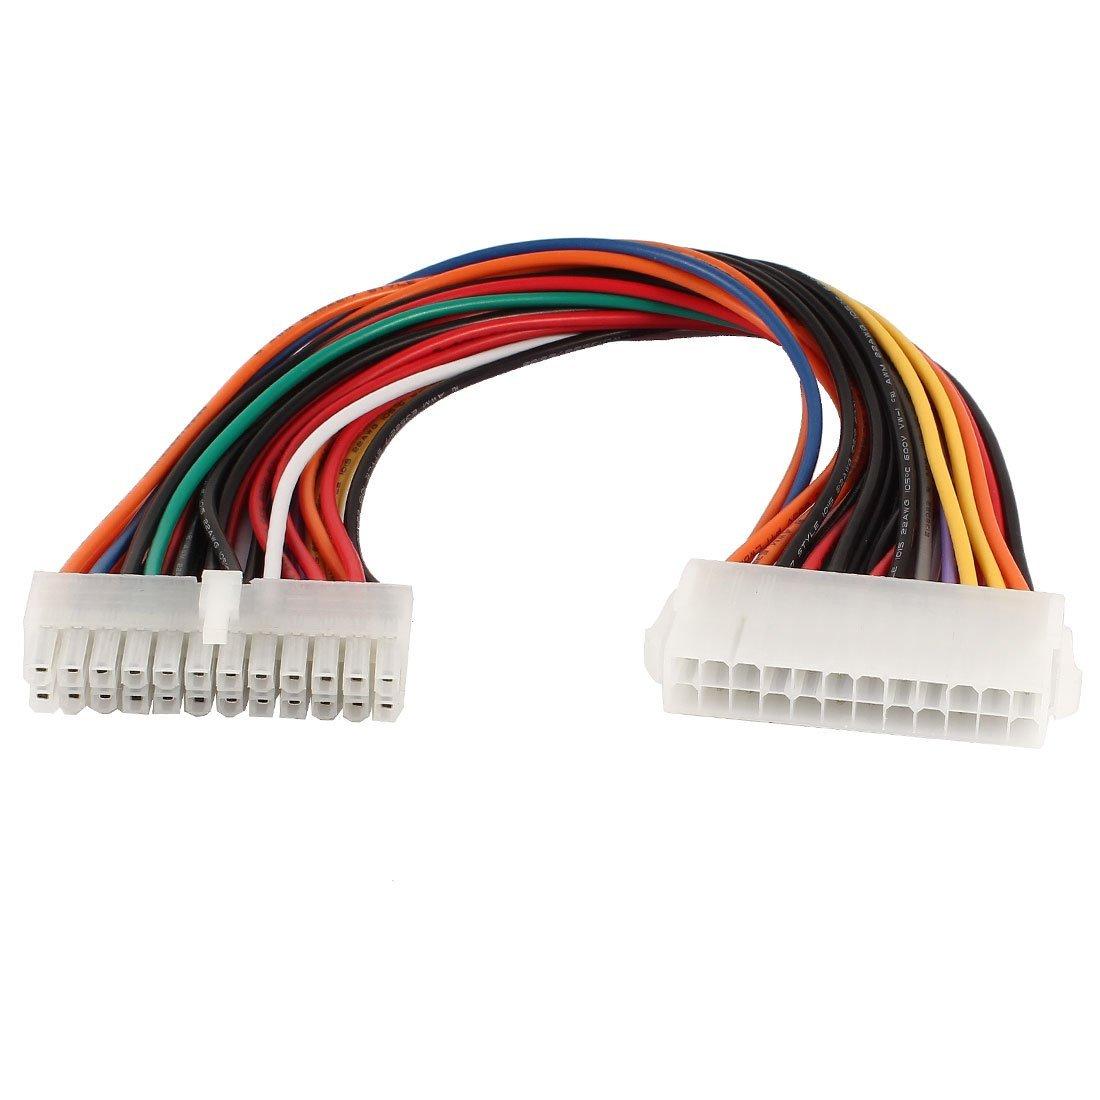 все цены на  ATX 24 Pin Male to 24 Pin Female Internal PC PSU Power Extension Cable  онлайн